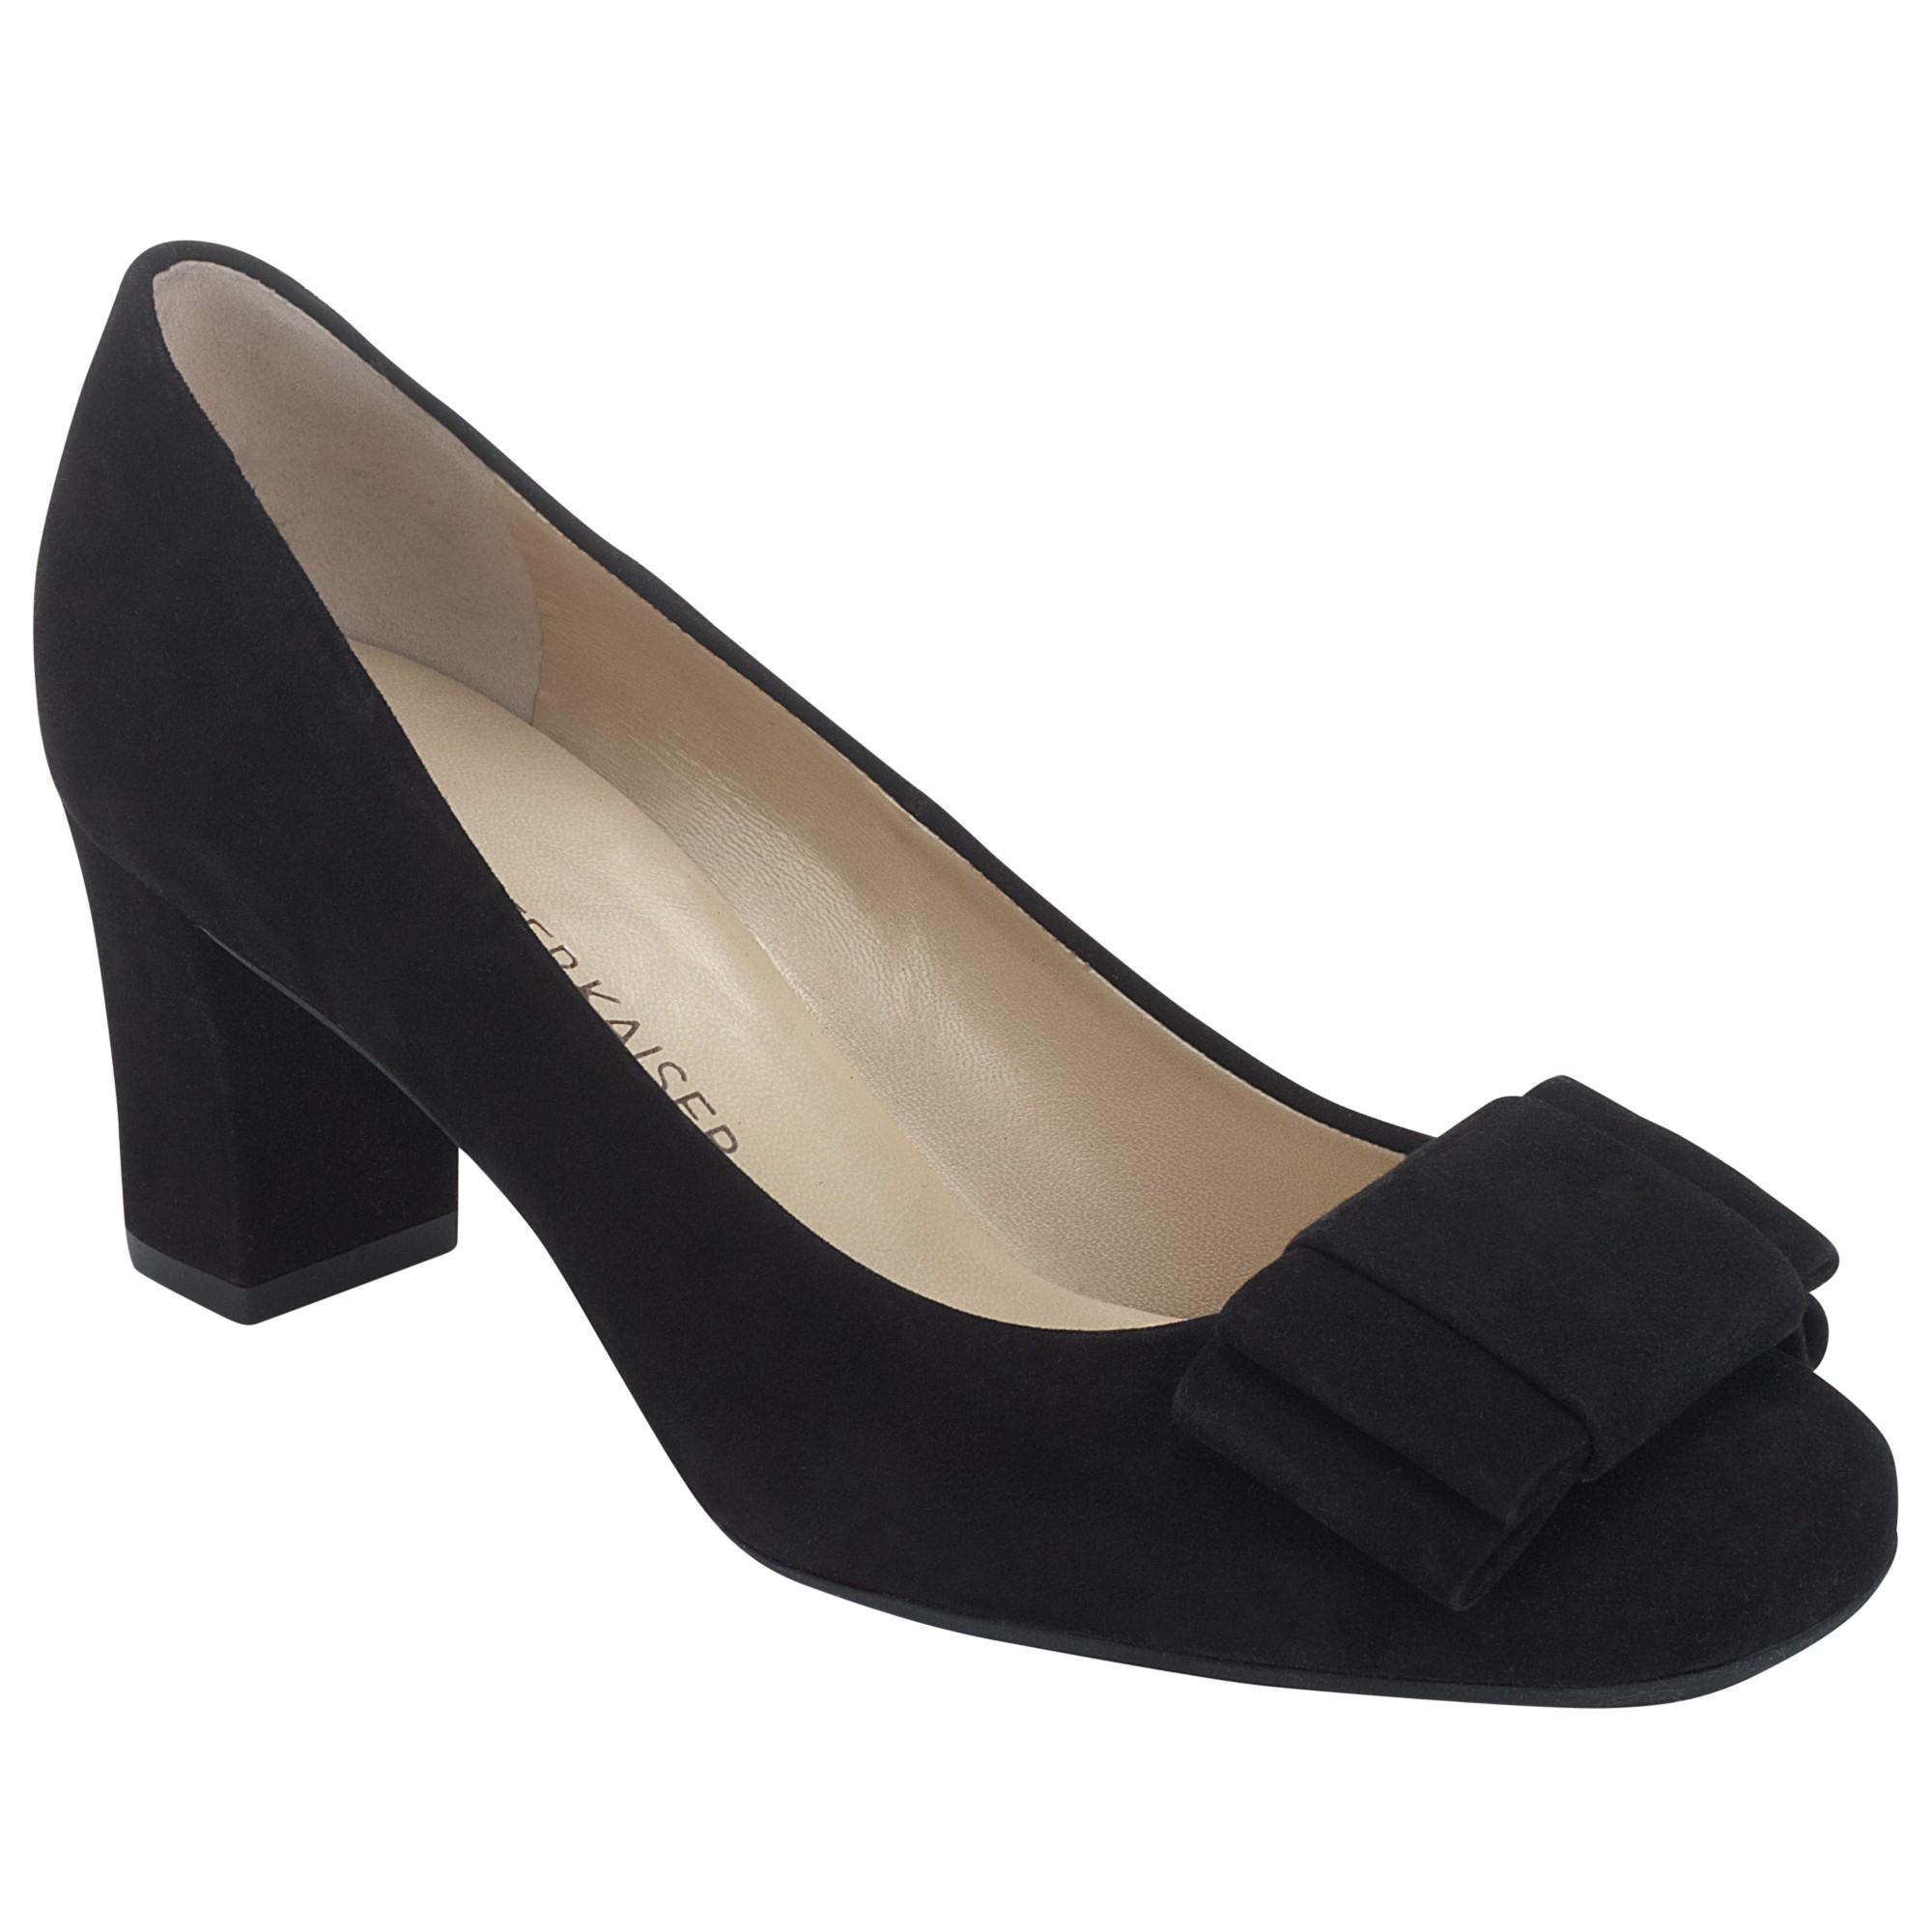 Carvela Kross  Stiletto Heeled Court Shoes